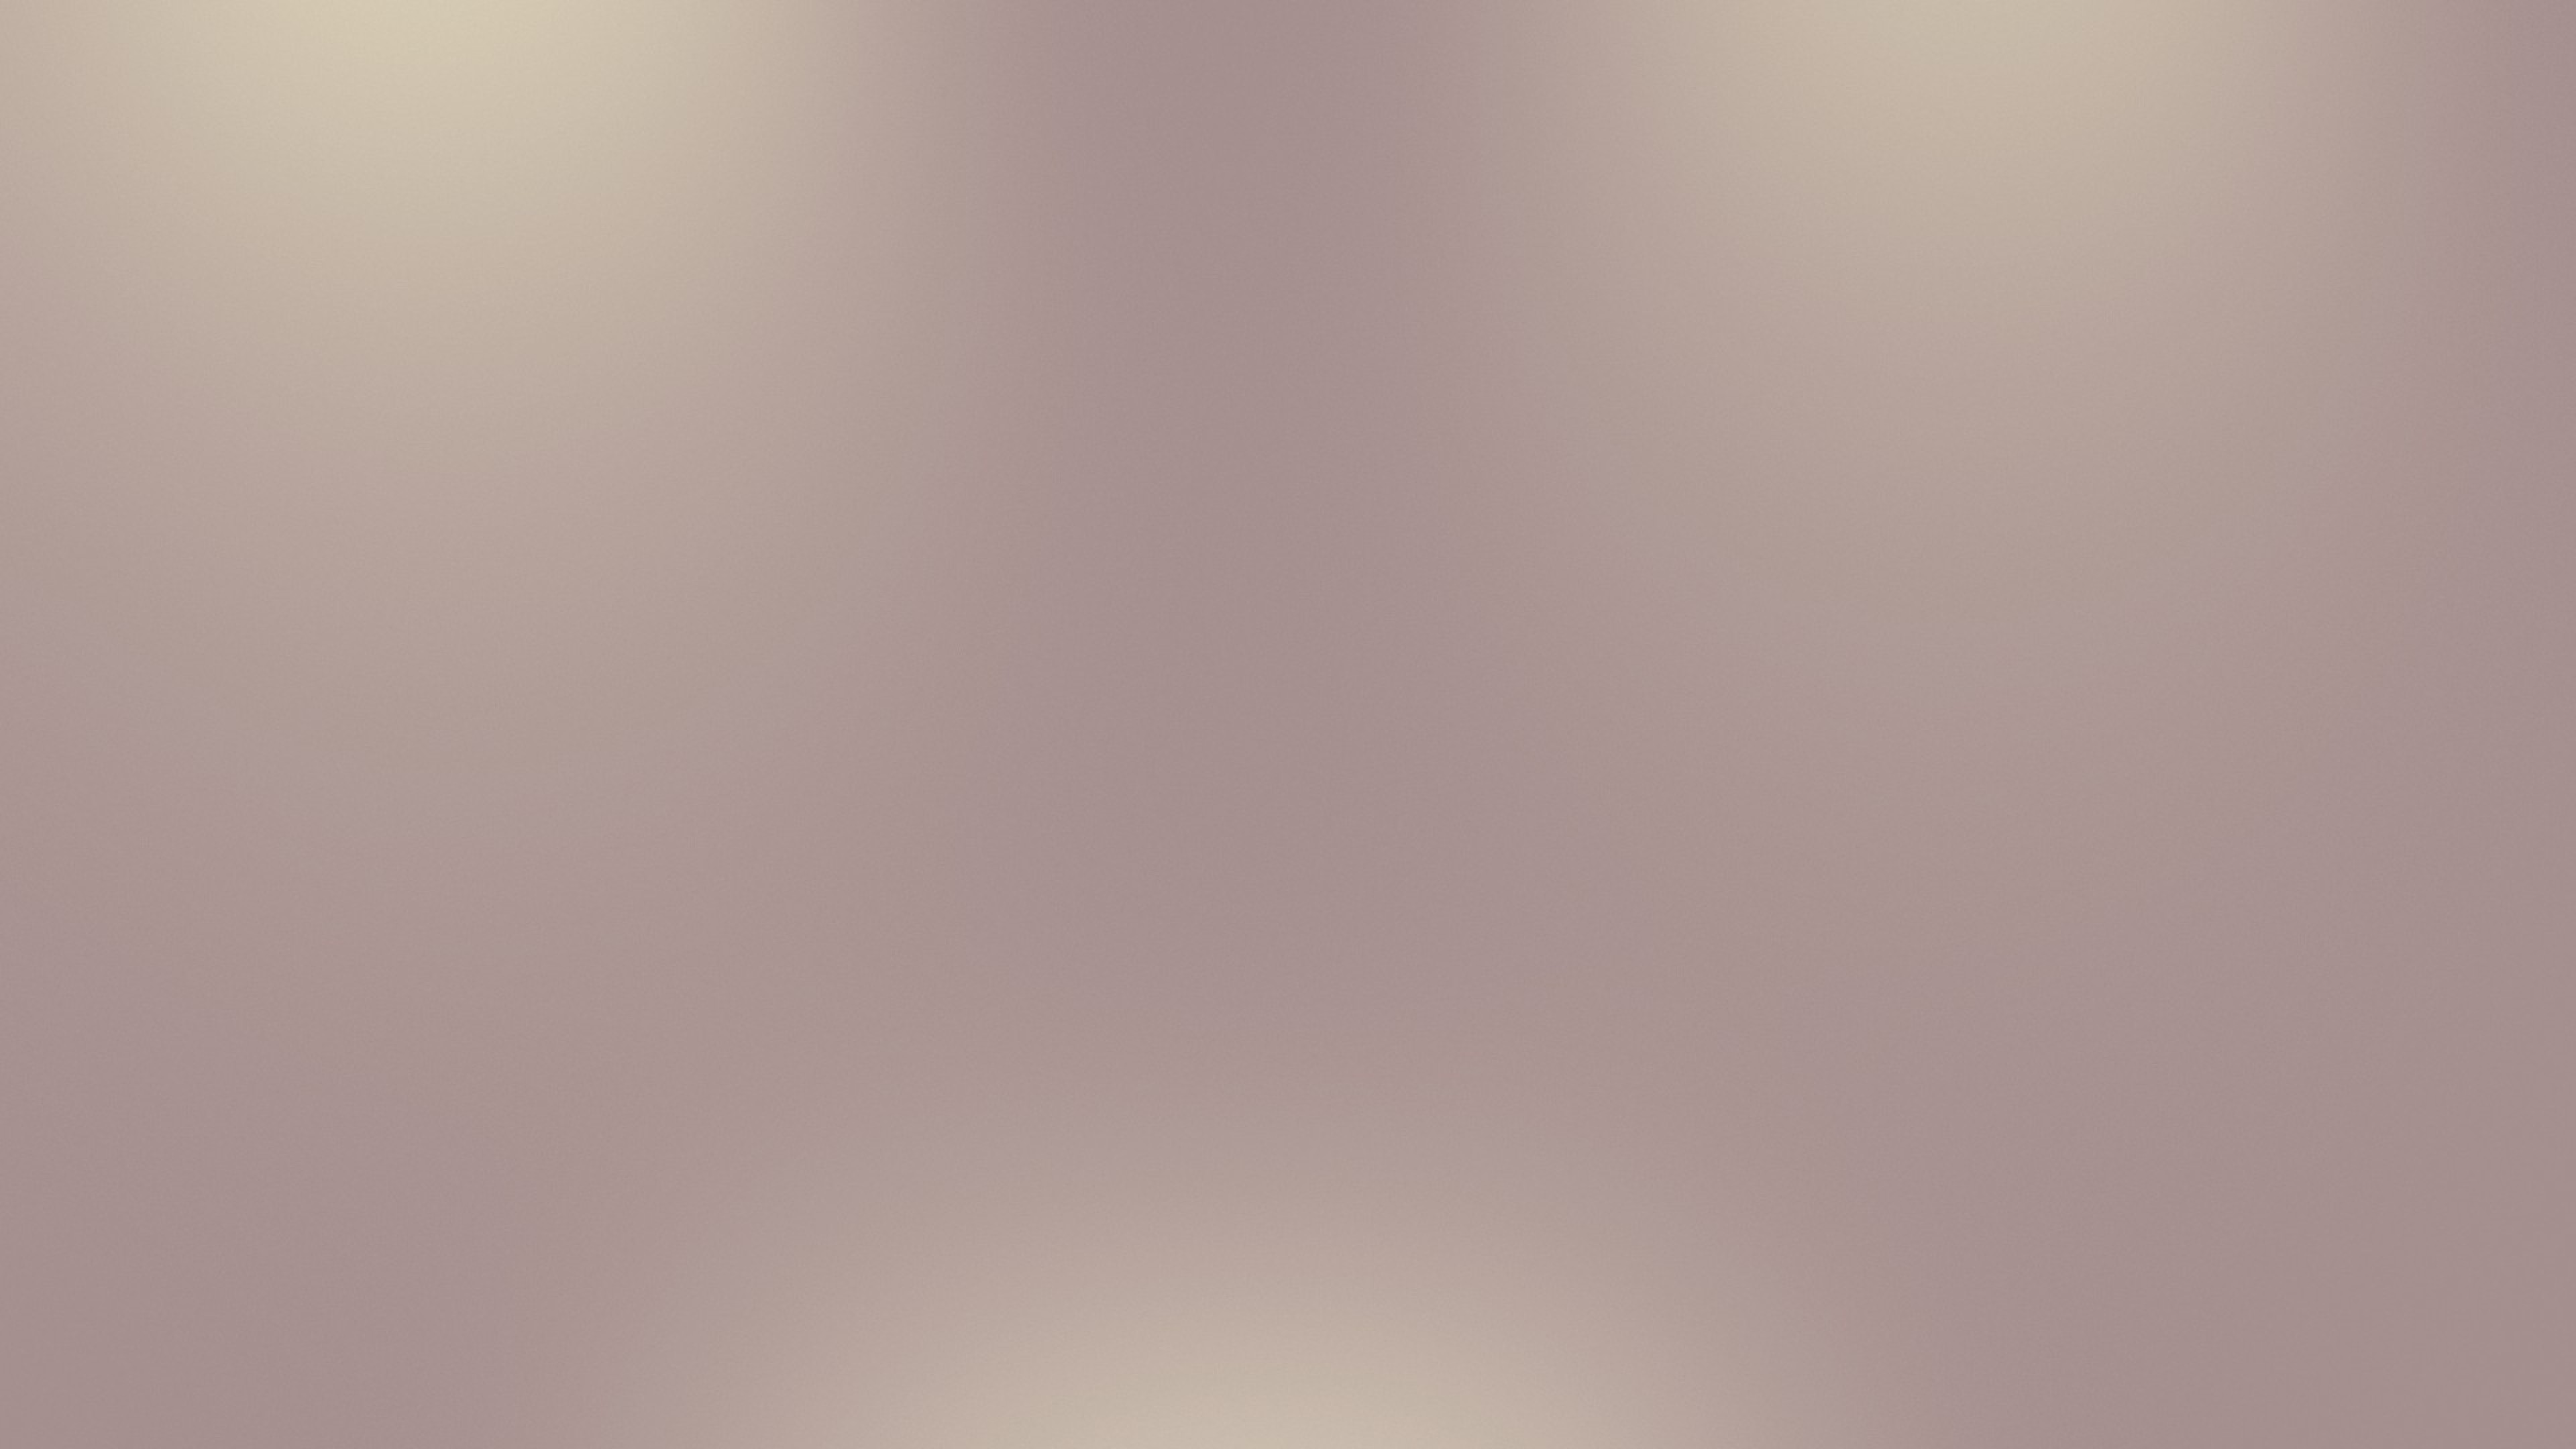 beige background  u00b7 u2460 download free beautiful hd backgrounds